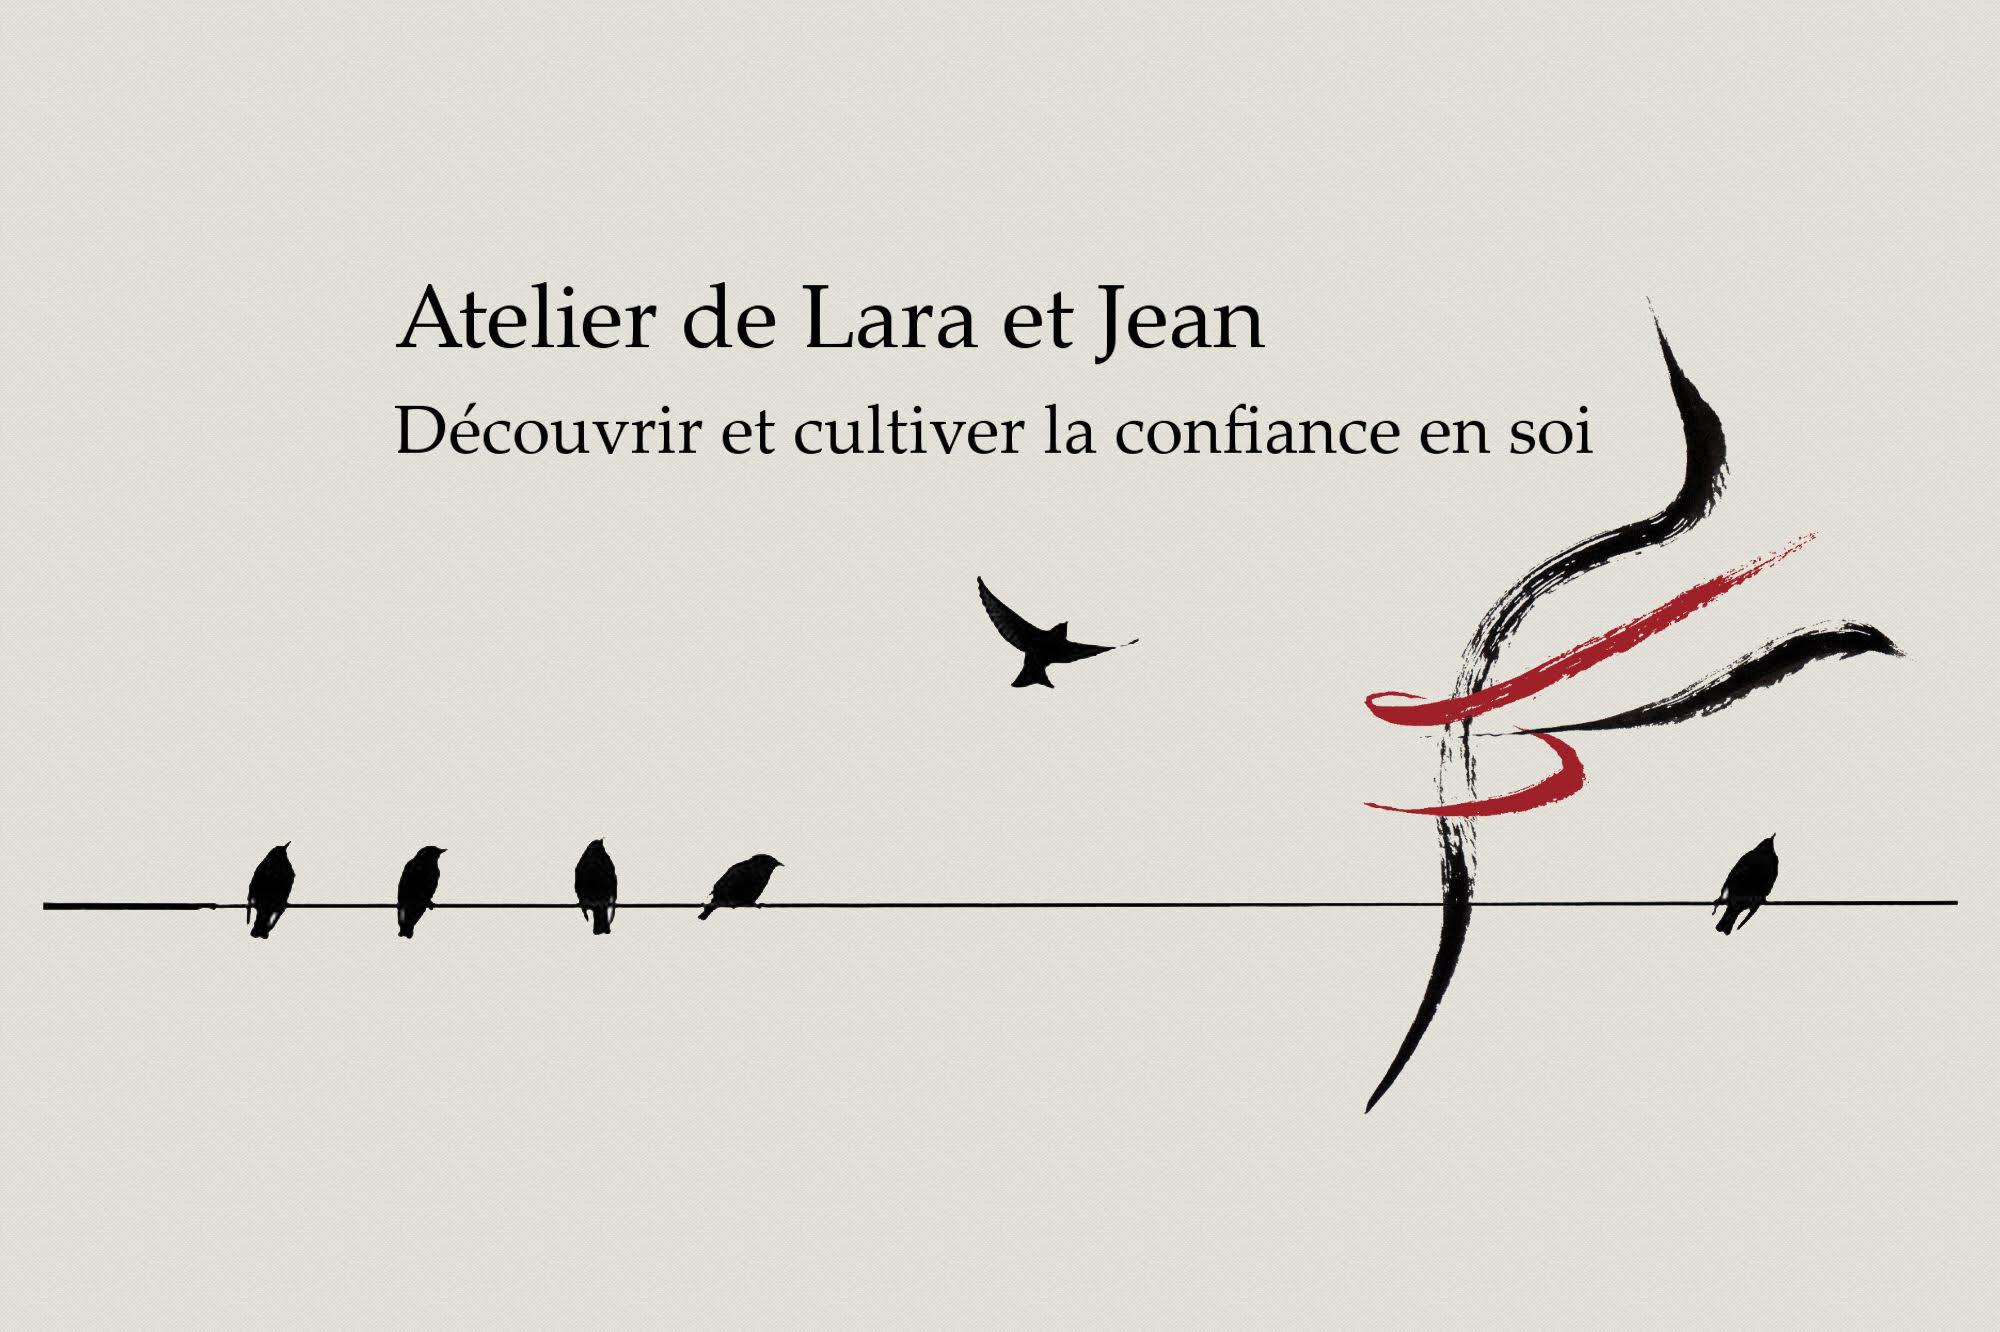 Atelier de Lara et Jean